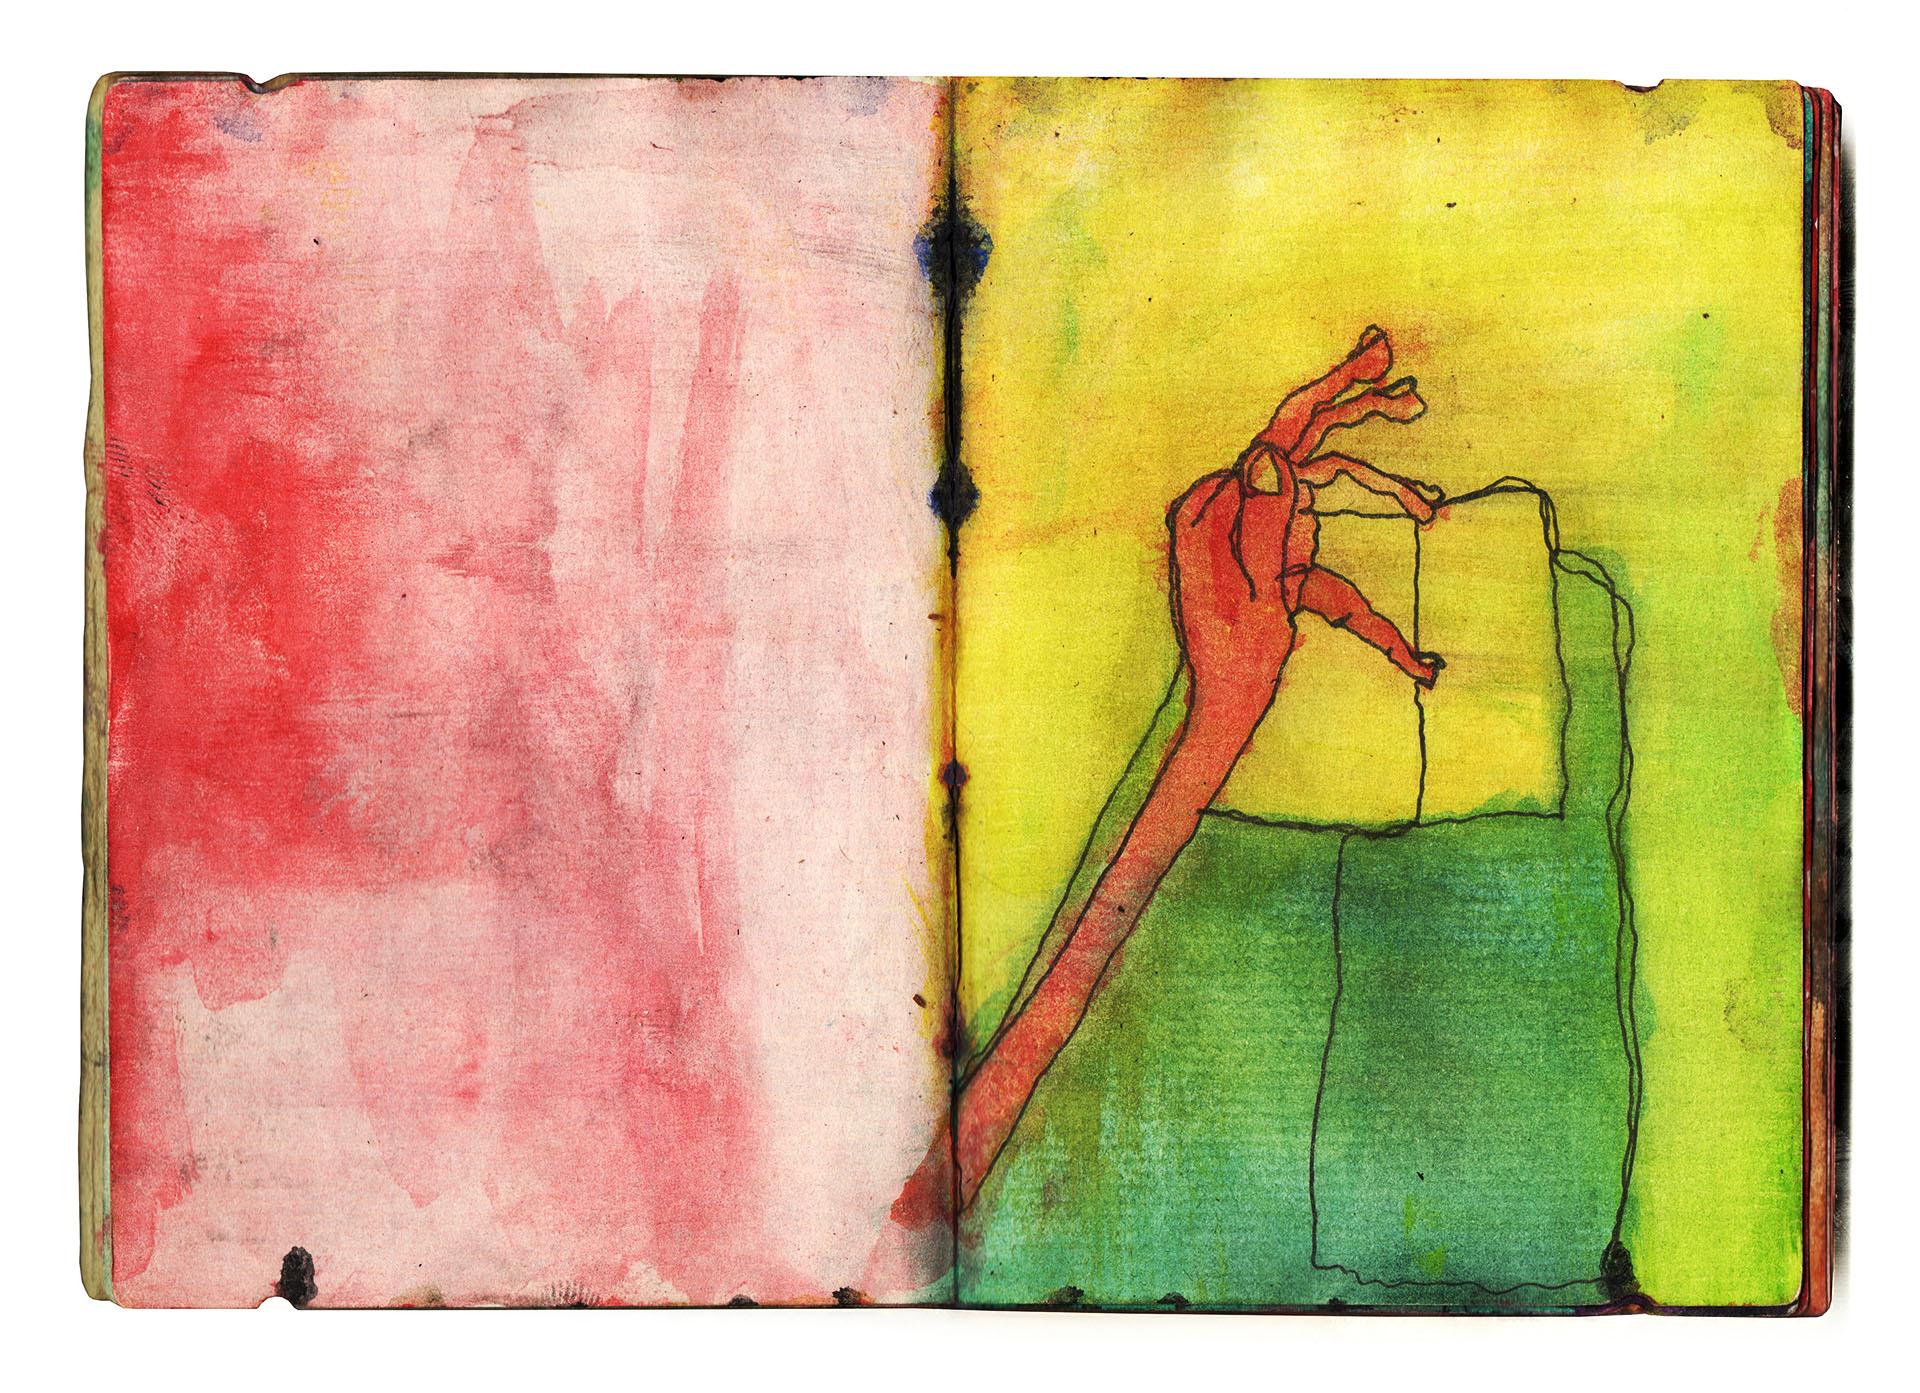 project sketchbook 03